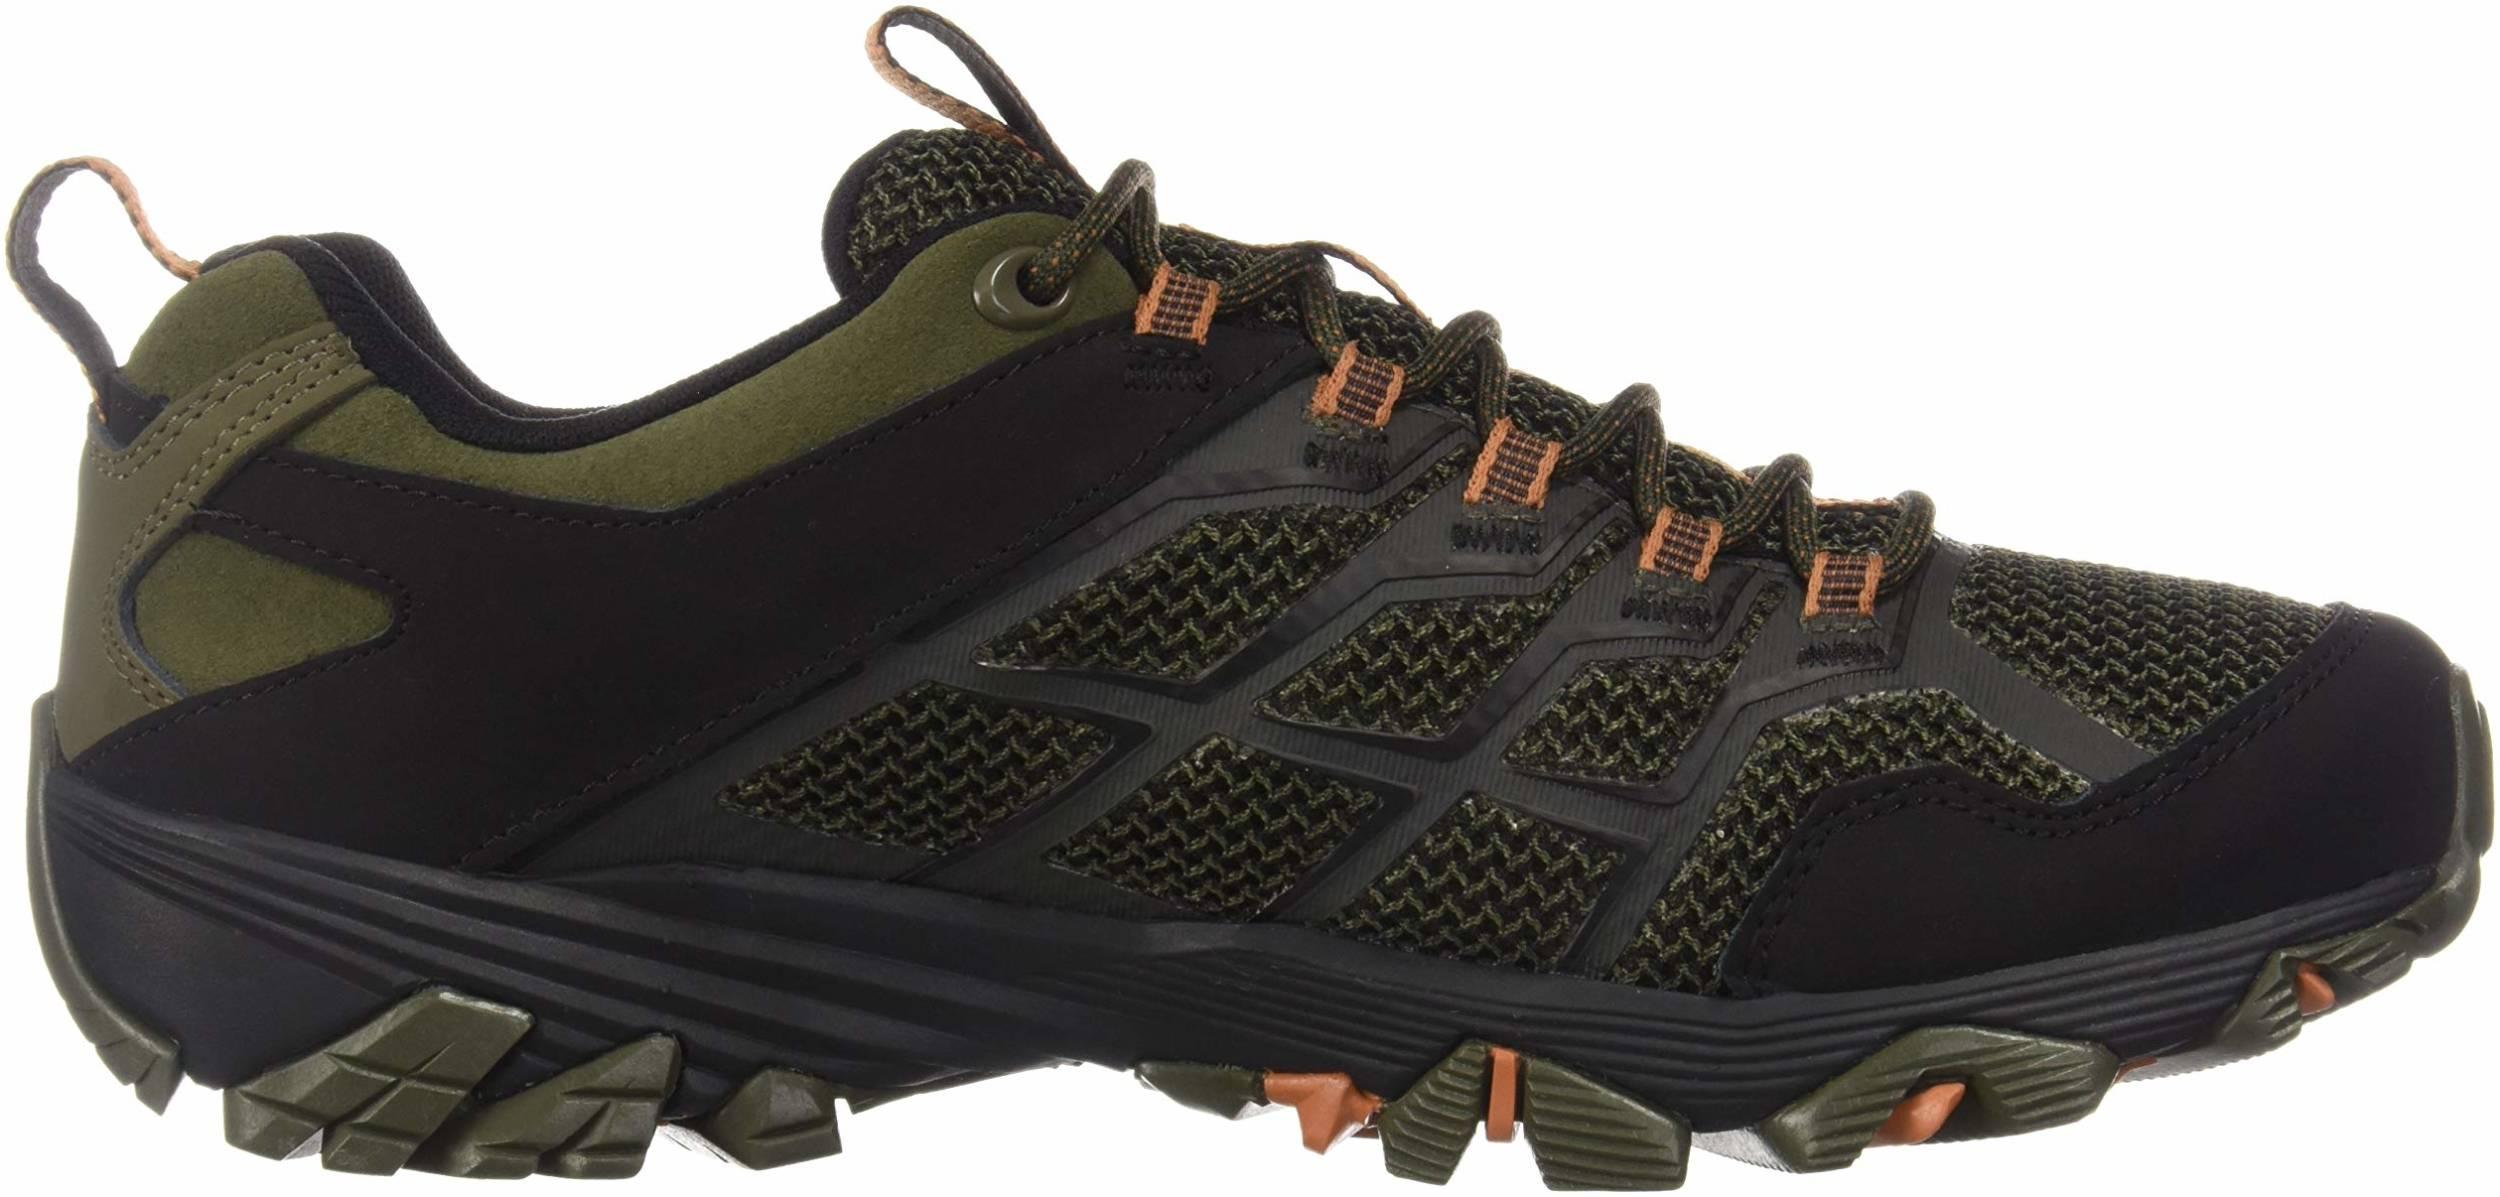 Review of Merrell Moab FST 2 Waterproof